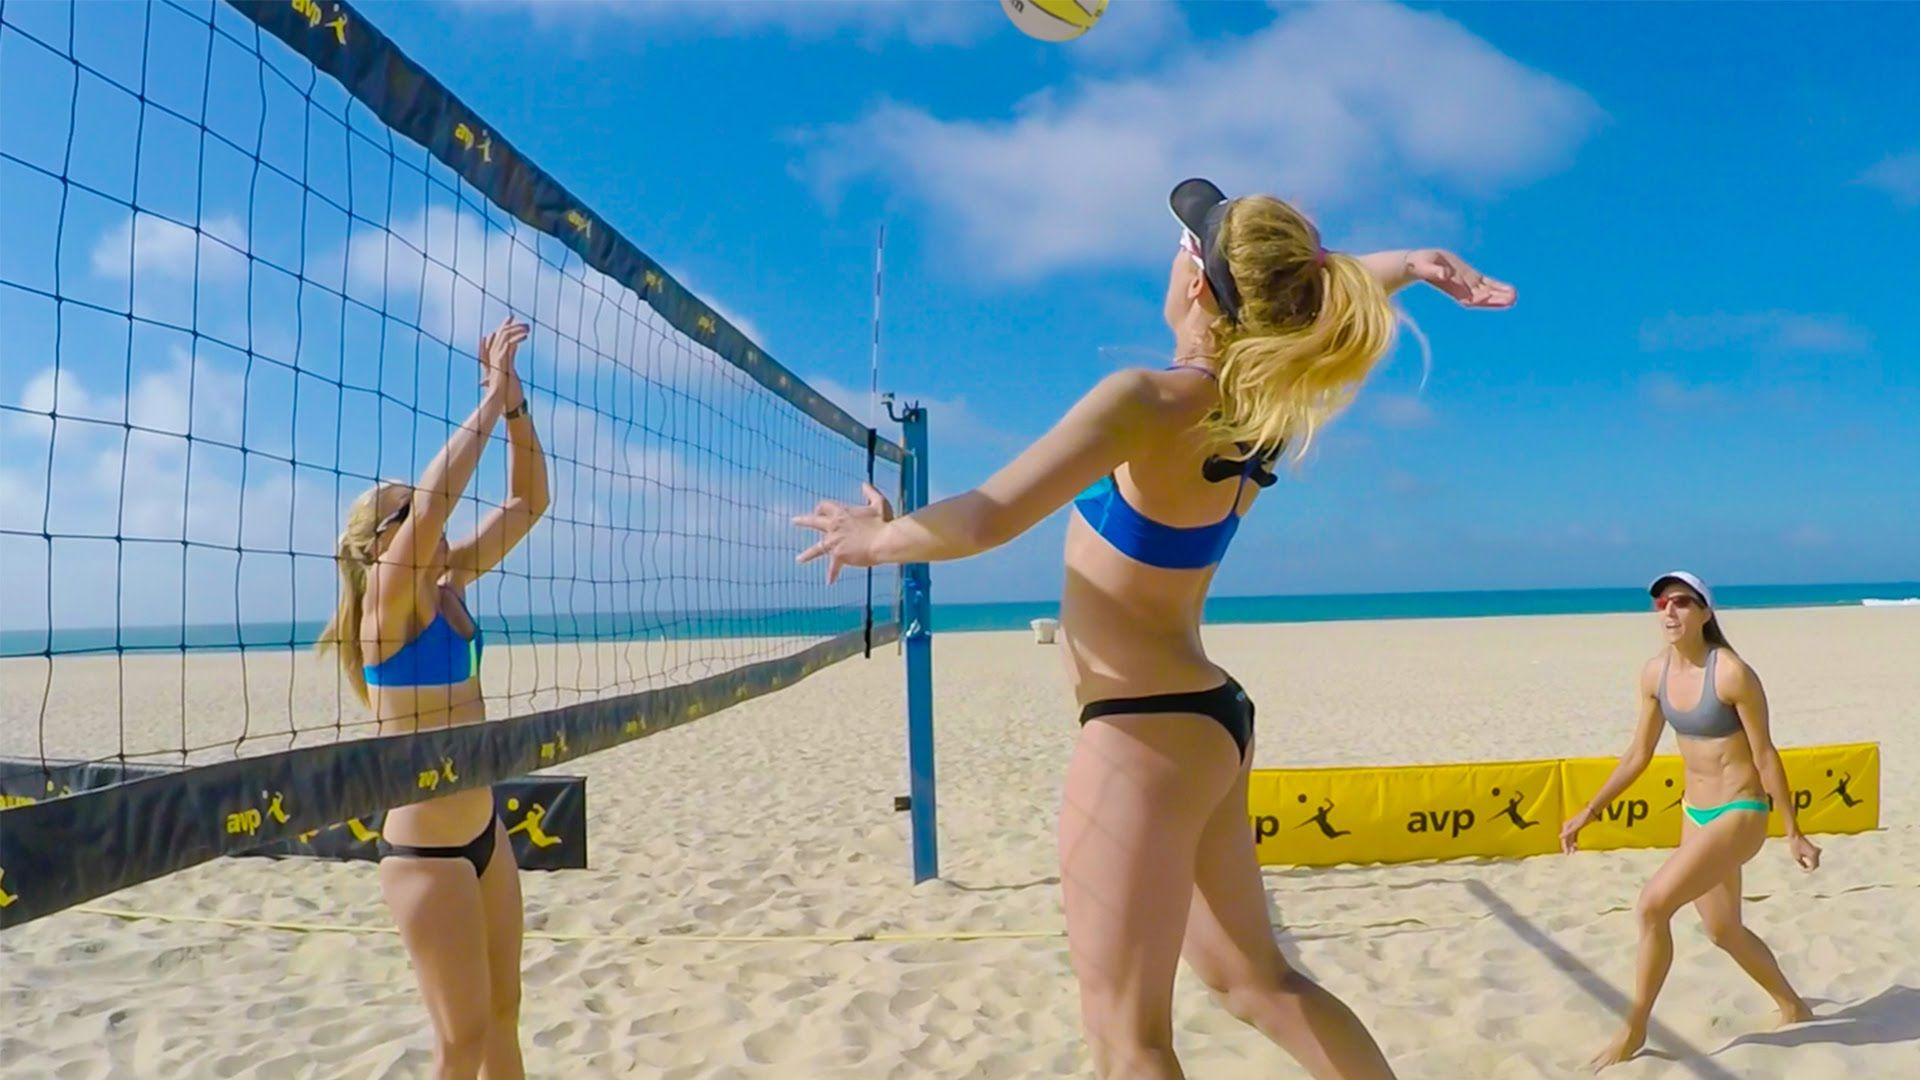 Bikini beach volleyball videos